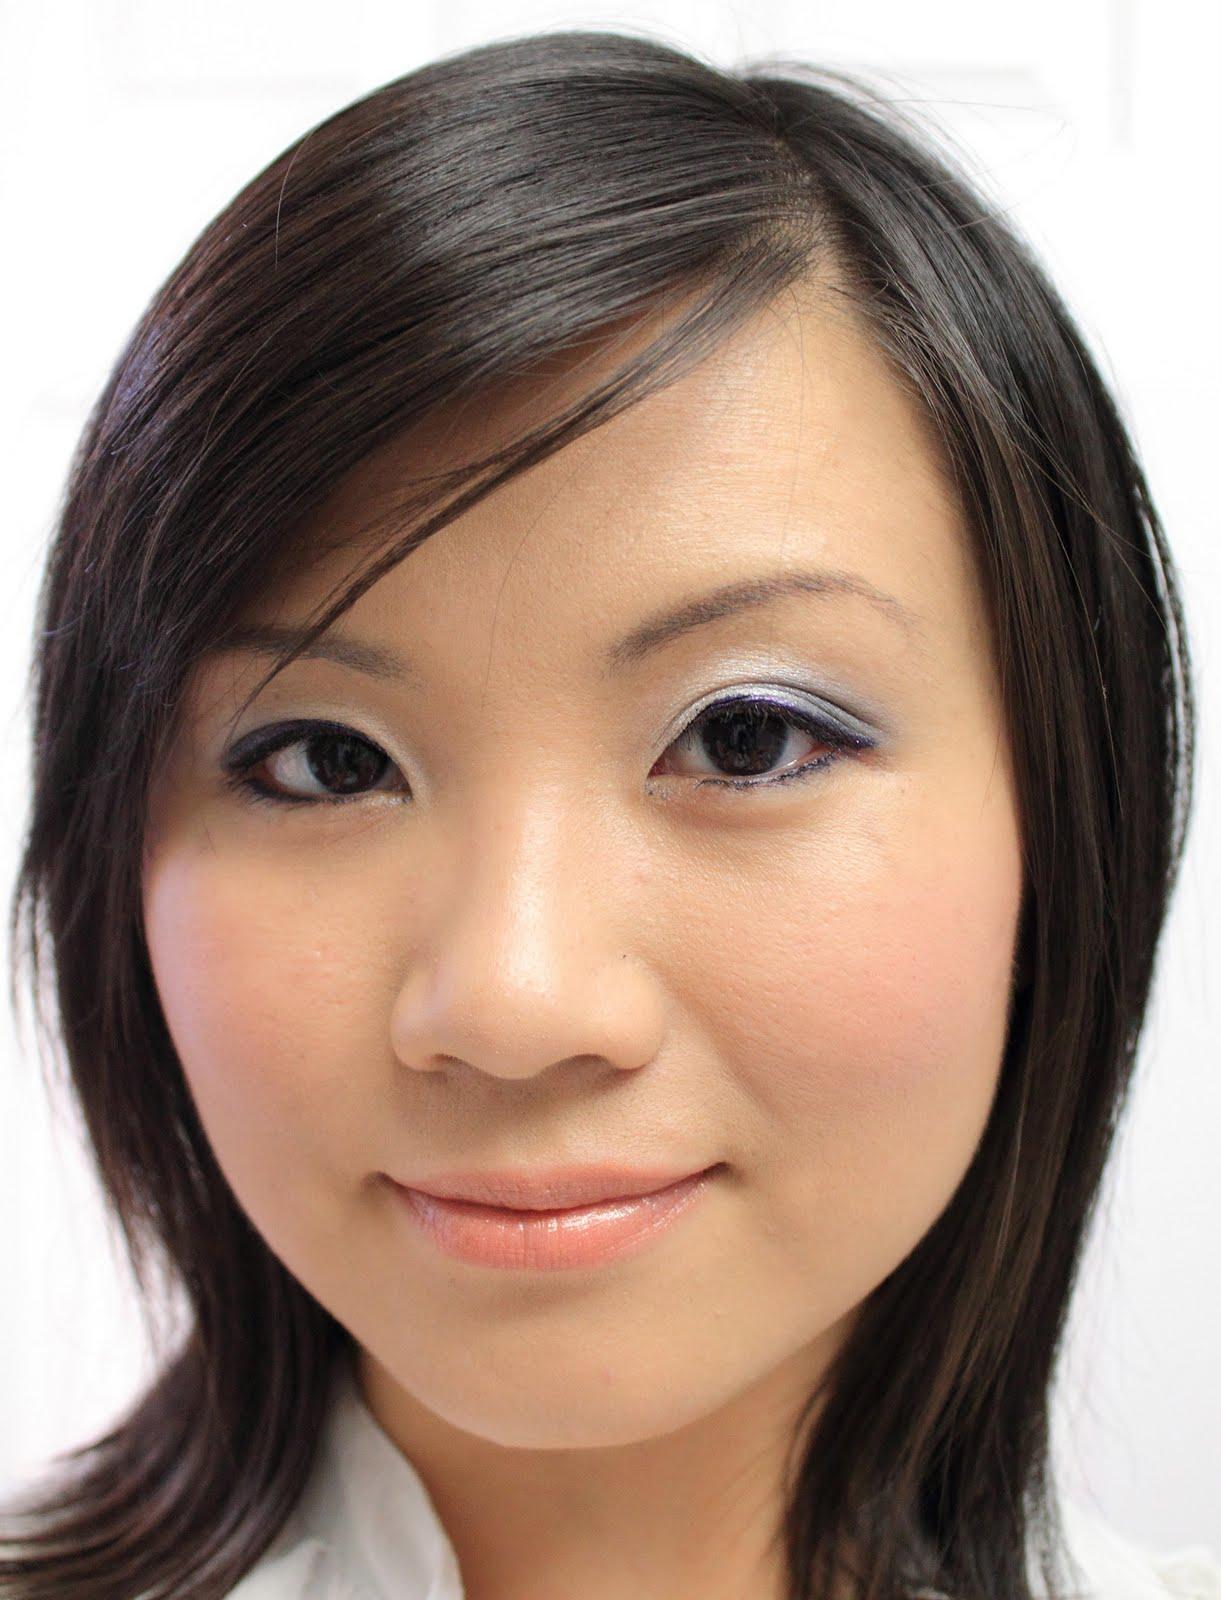 Tiny Asian Bukkake Asian Bukkake Cumshot Facial - Telegraph